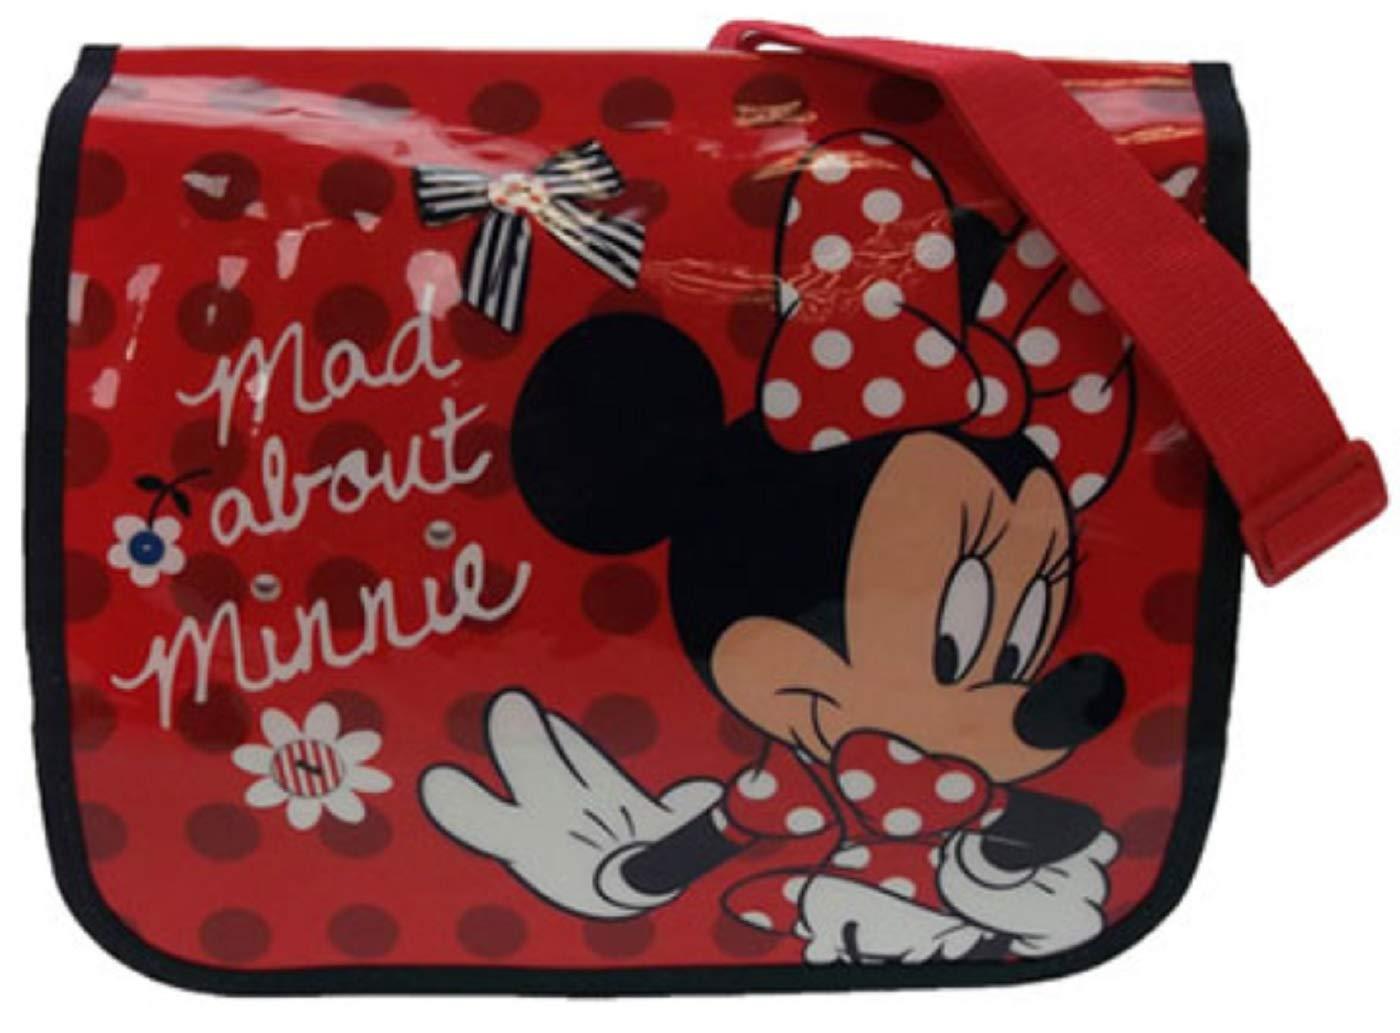 Mad about Minnie Despatch Sac